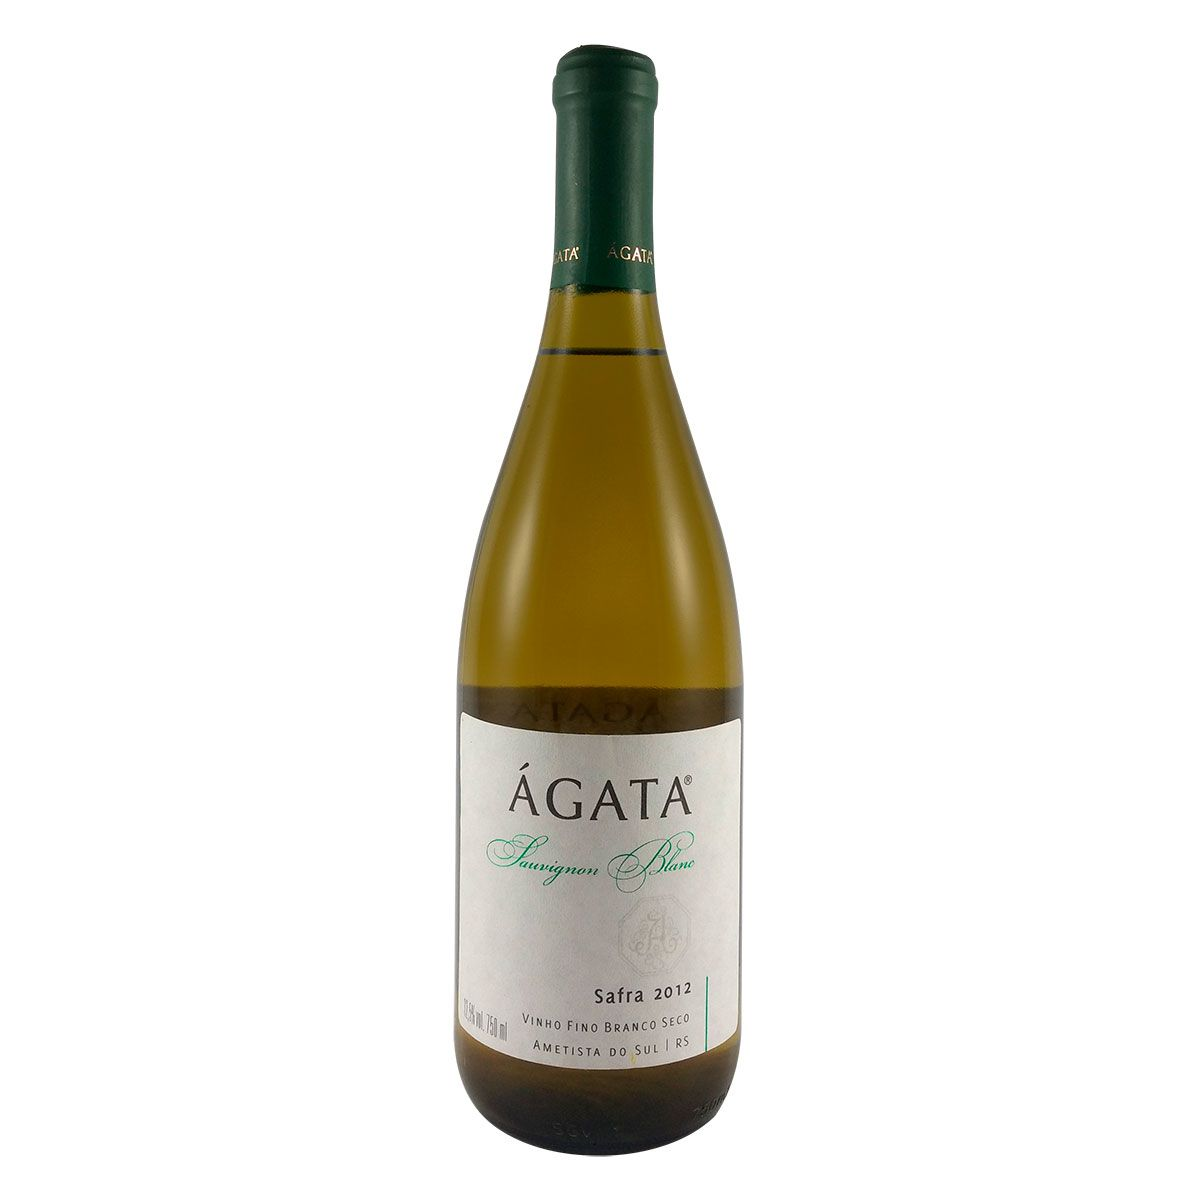 Vinho Fino Branco Seco Ágata Sauvignon Blanc 2012 750ml